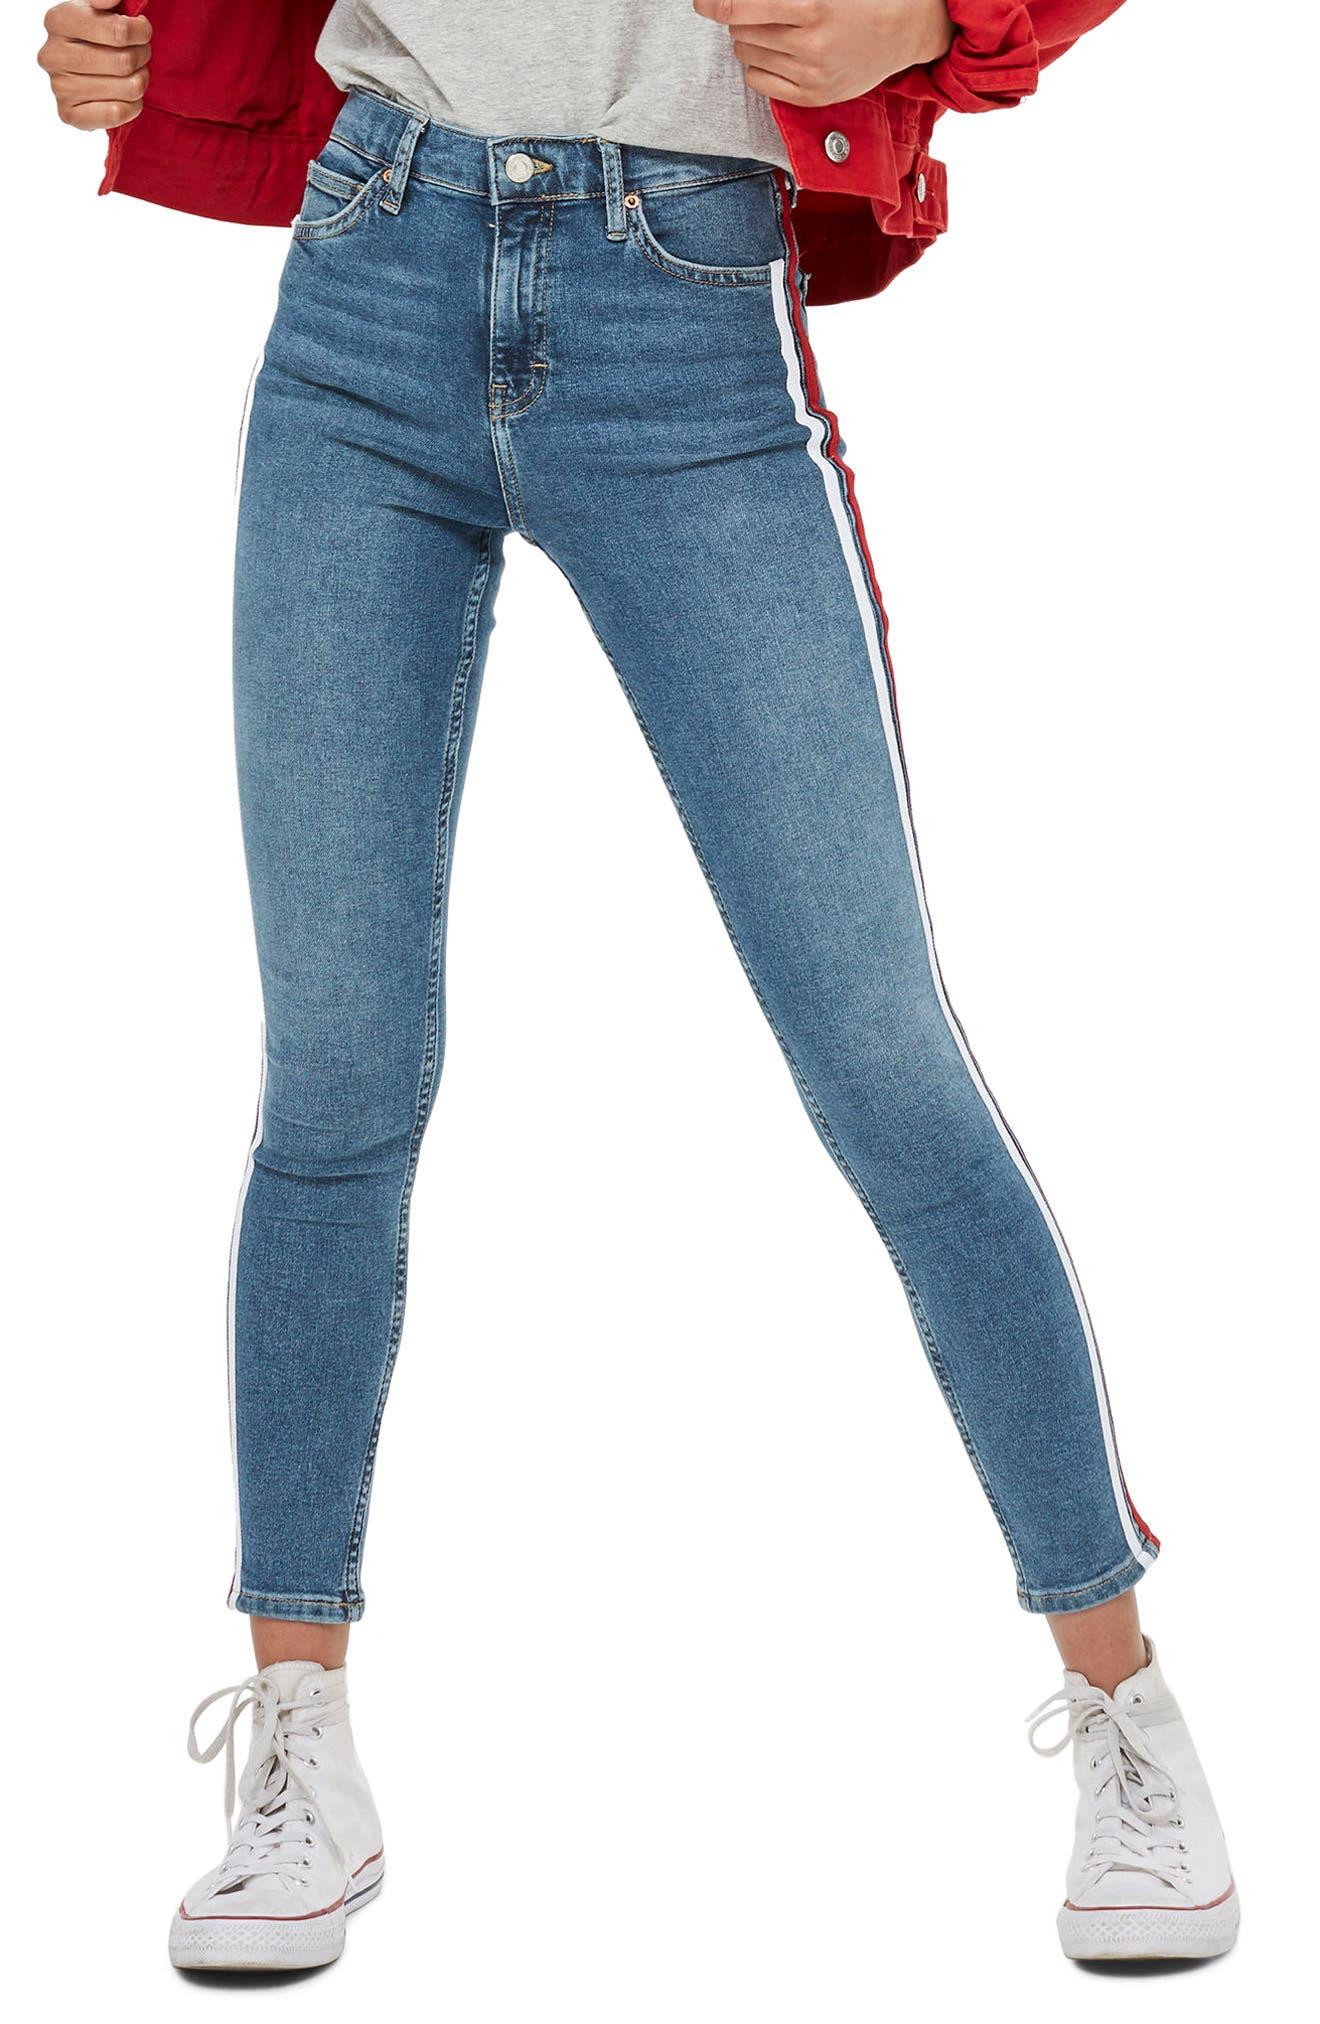 Jamie Side Stripe Jeans,                         Main,                         color, Mid Denim Multi